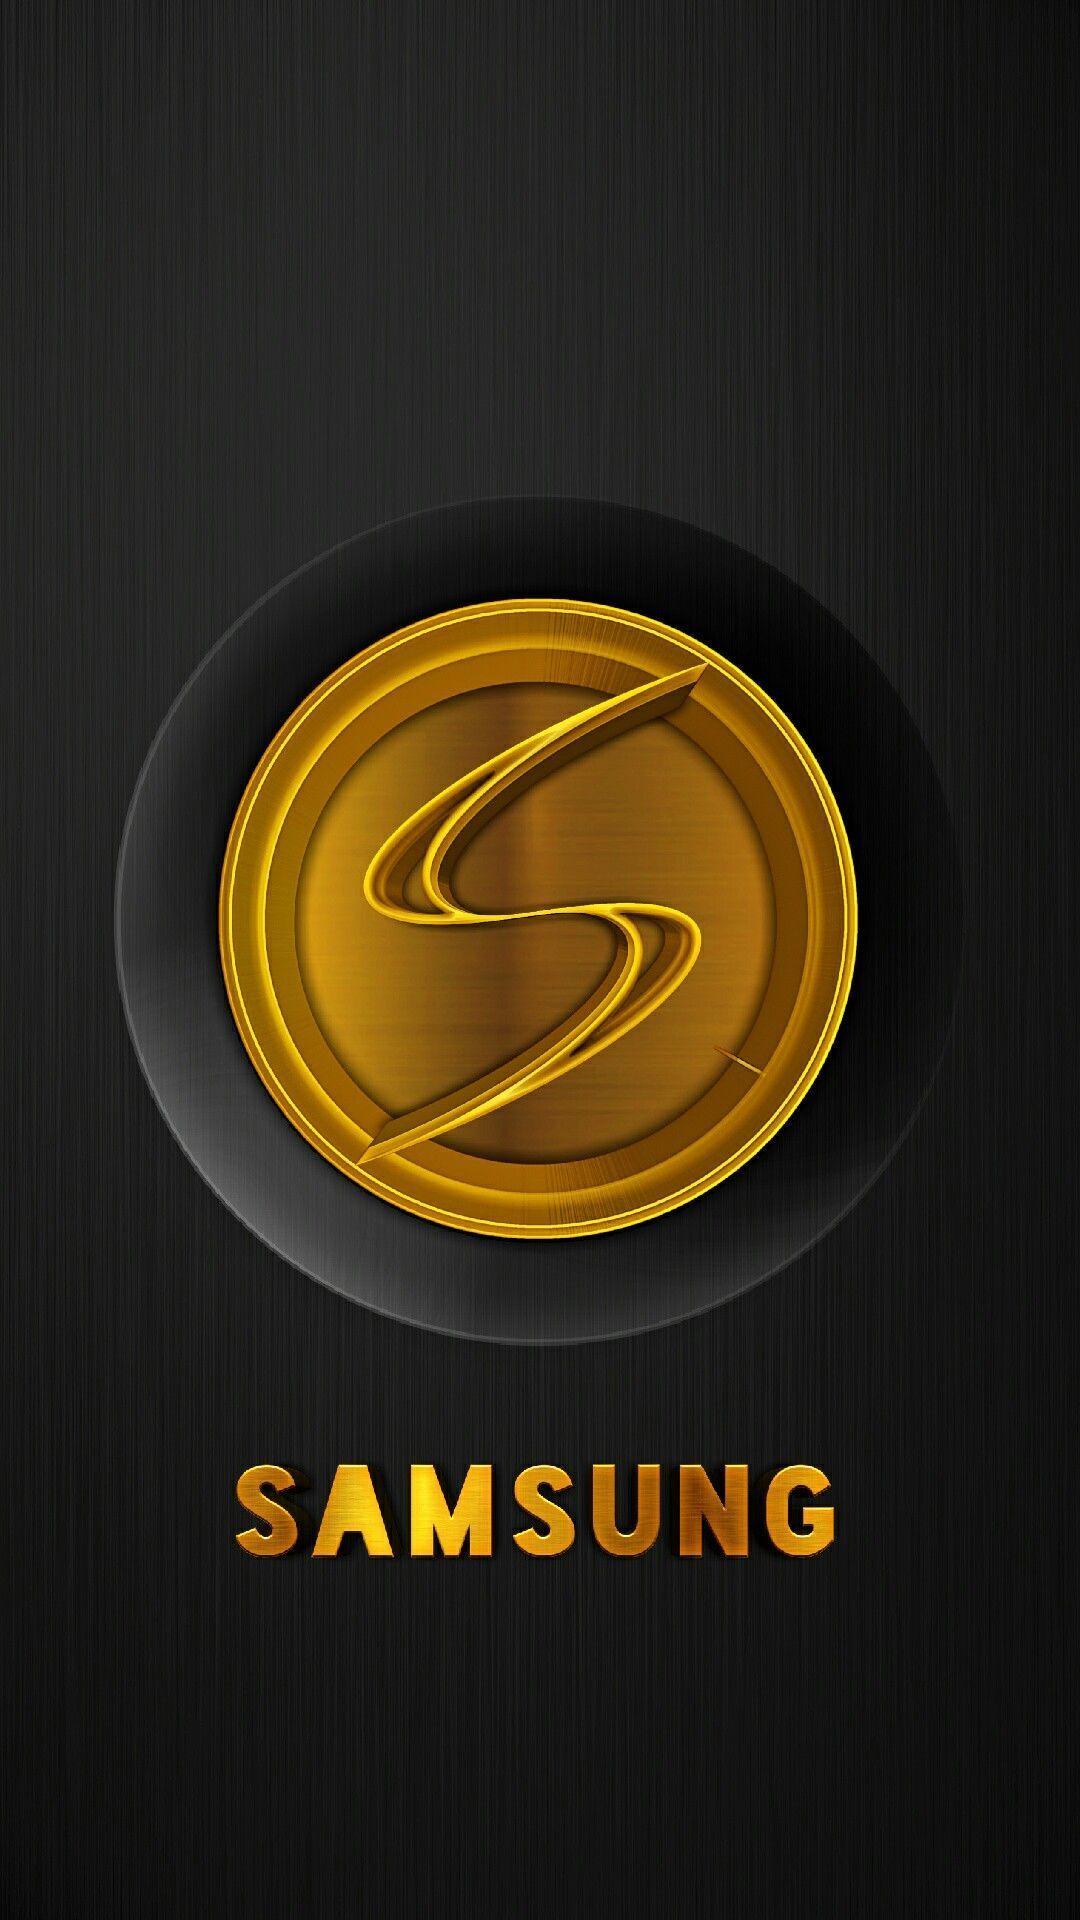 Samsung 3d Wallpapers Top Free Samsung 3d Backgrounds Wallpaperaccess